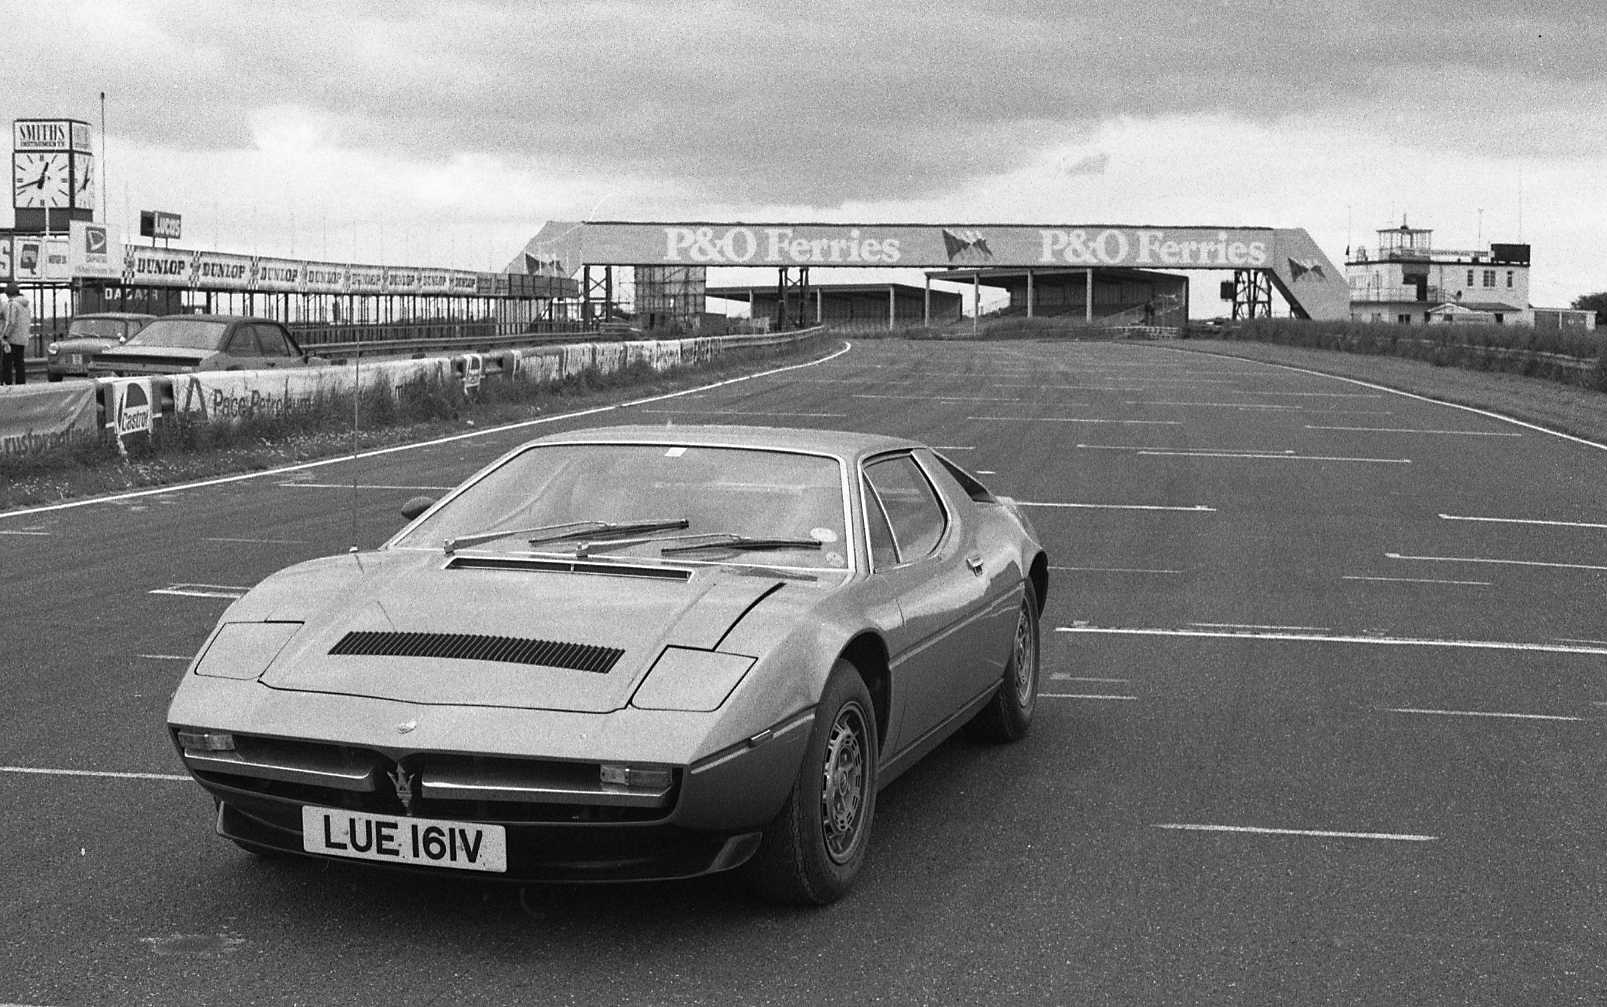 003 1981 Maserati Merak Thruxton (2).jpg